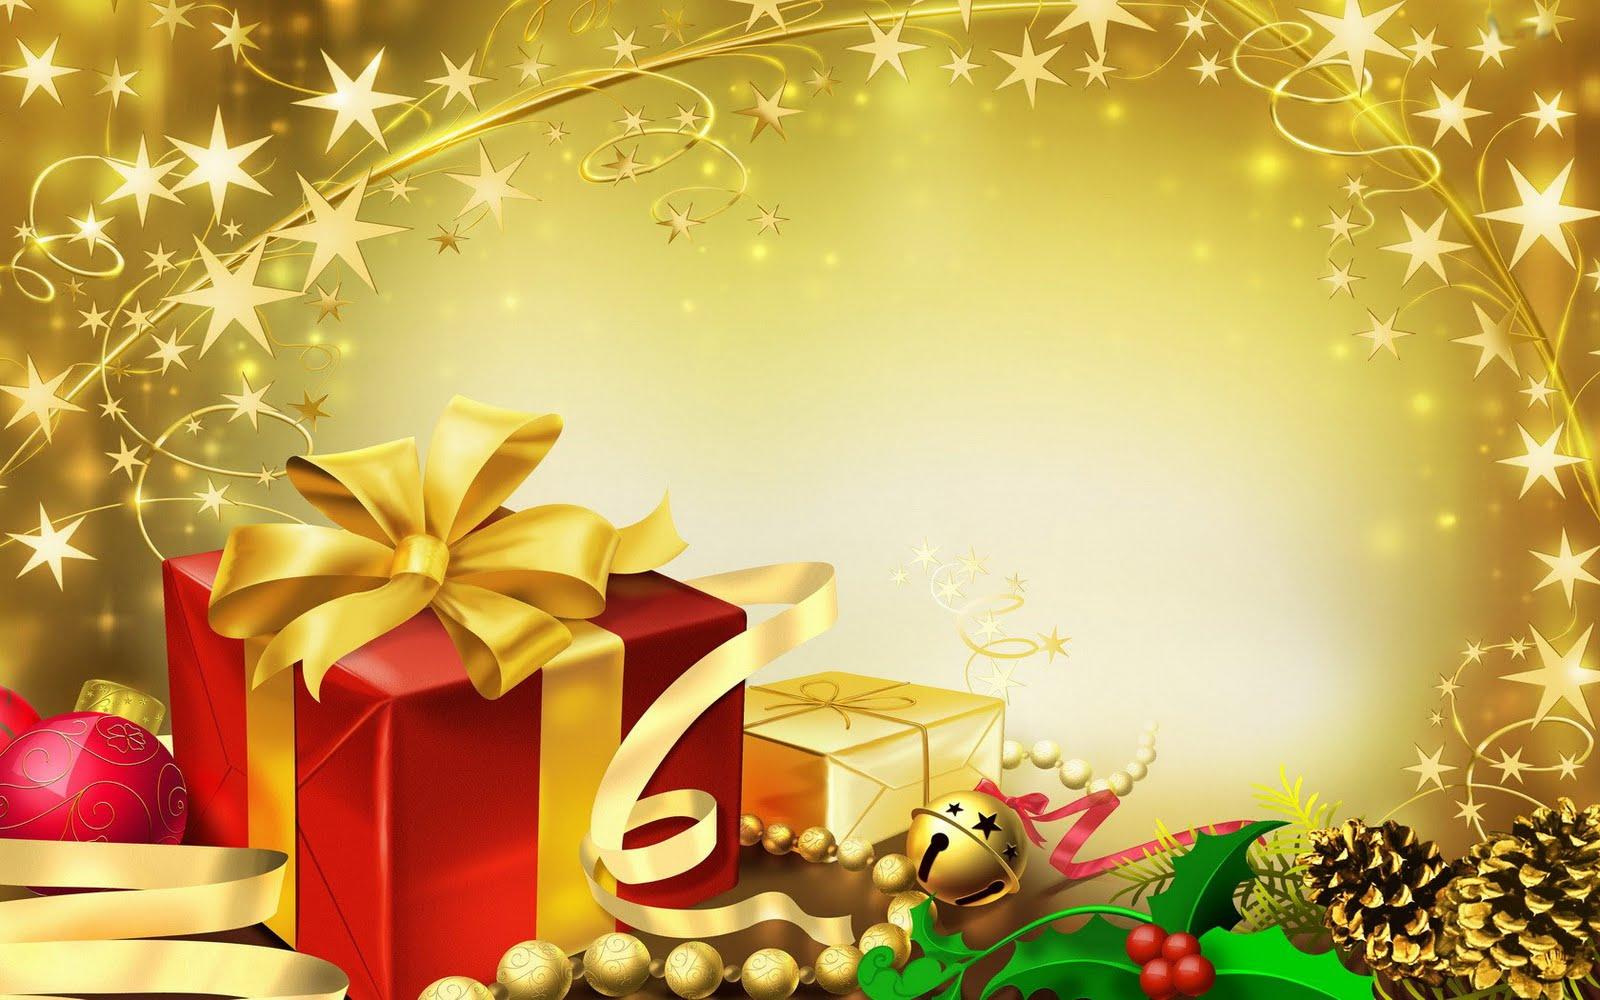 free wallpaper christmas present - photo #10